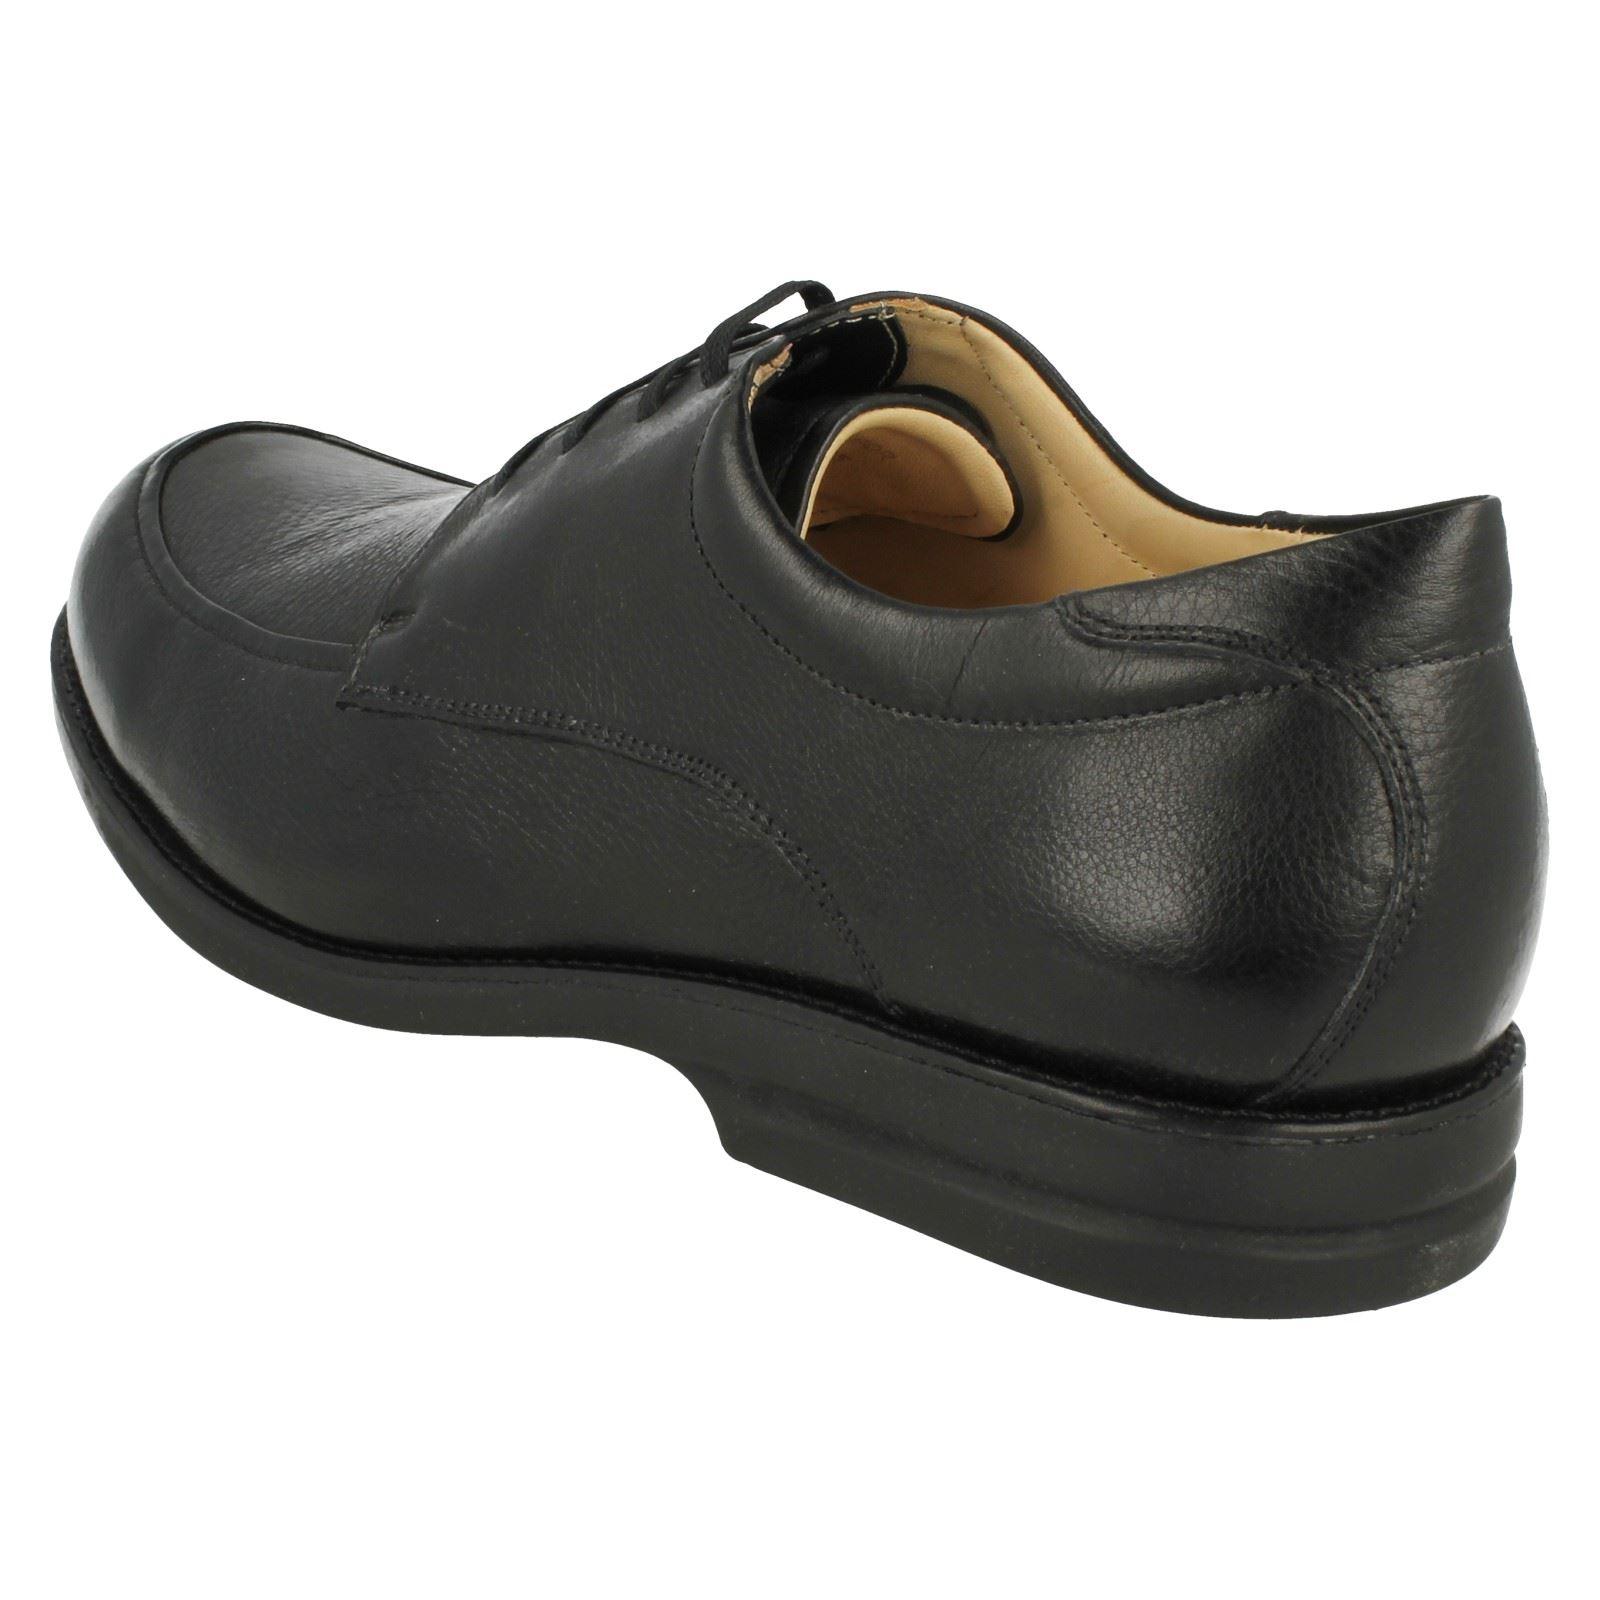 Anatomic Uomo Anatomic  Smart Leder Schuhes Anapolis e83156